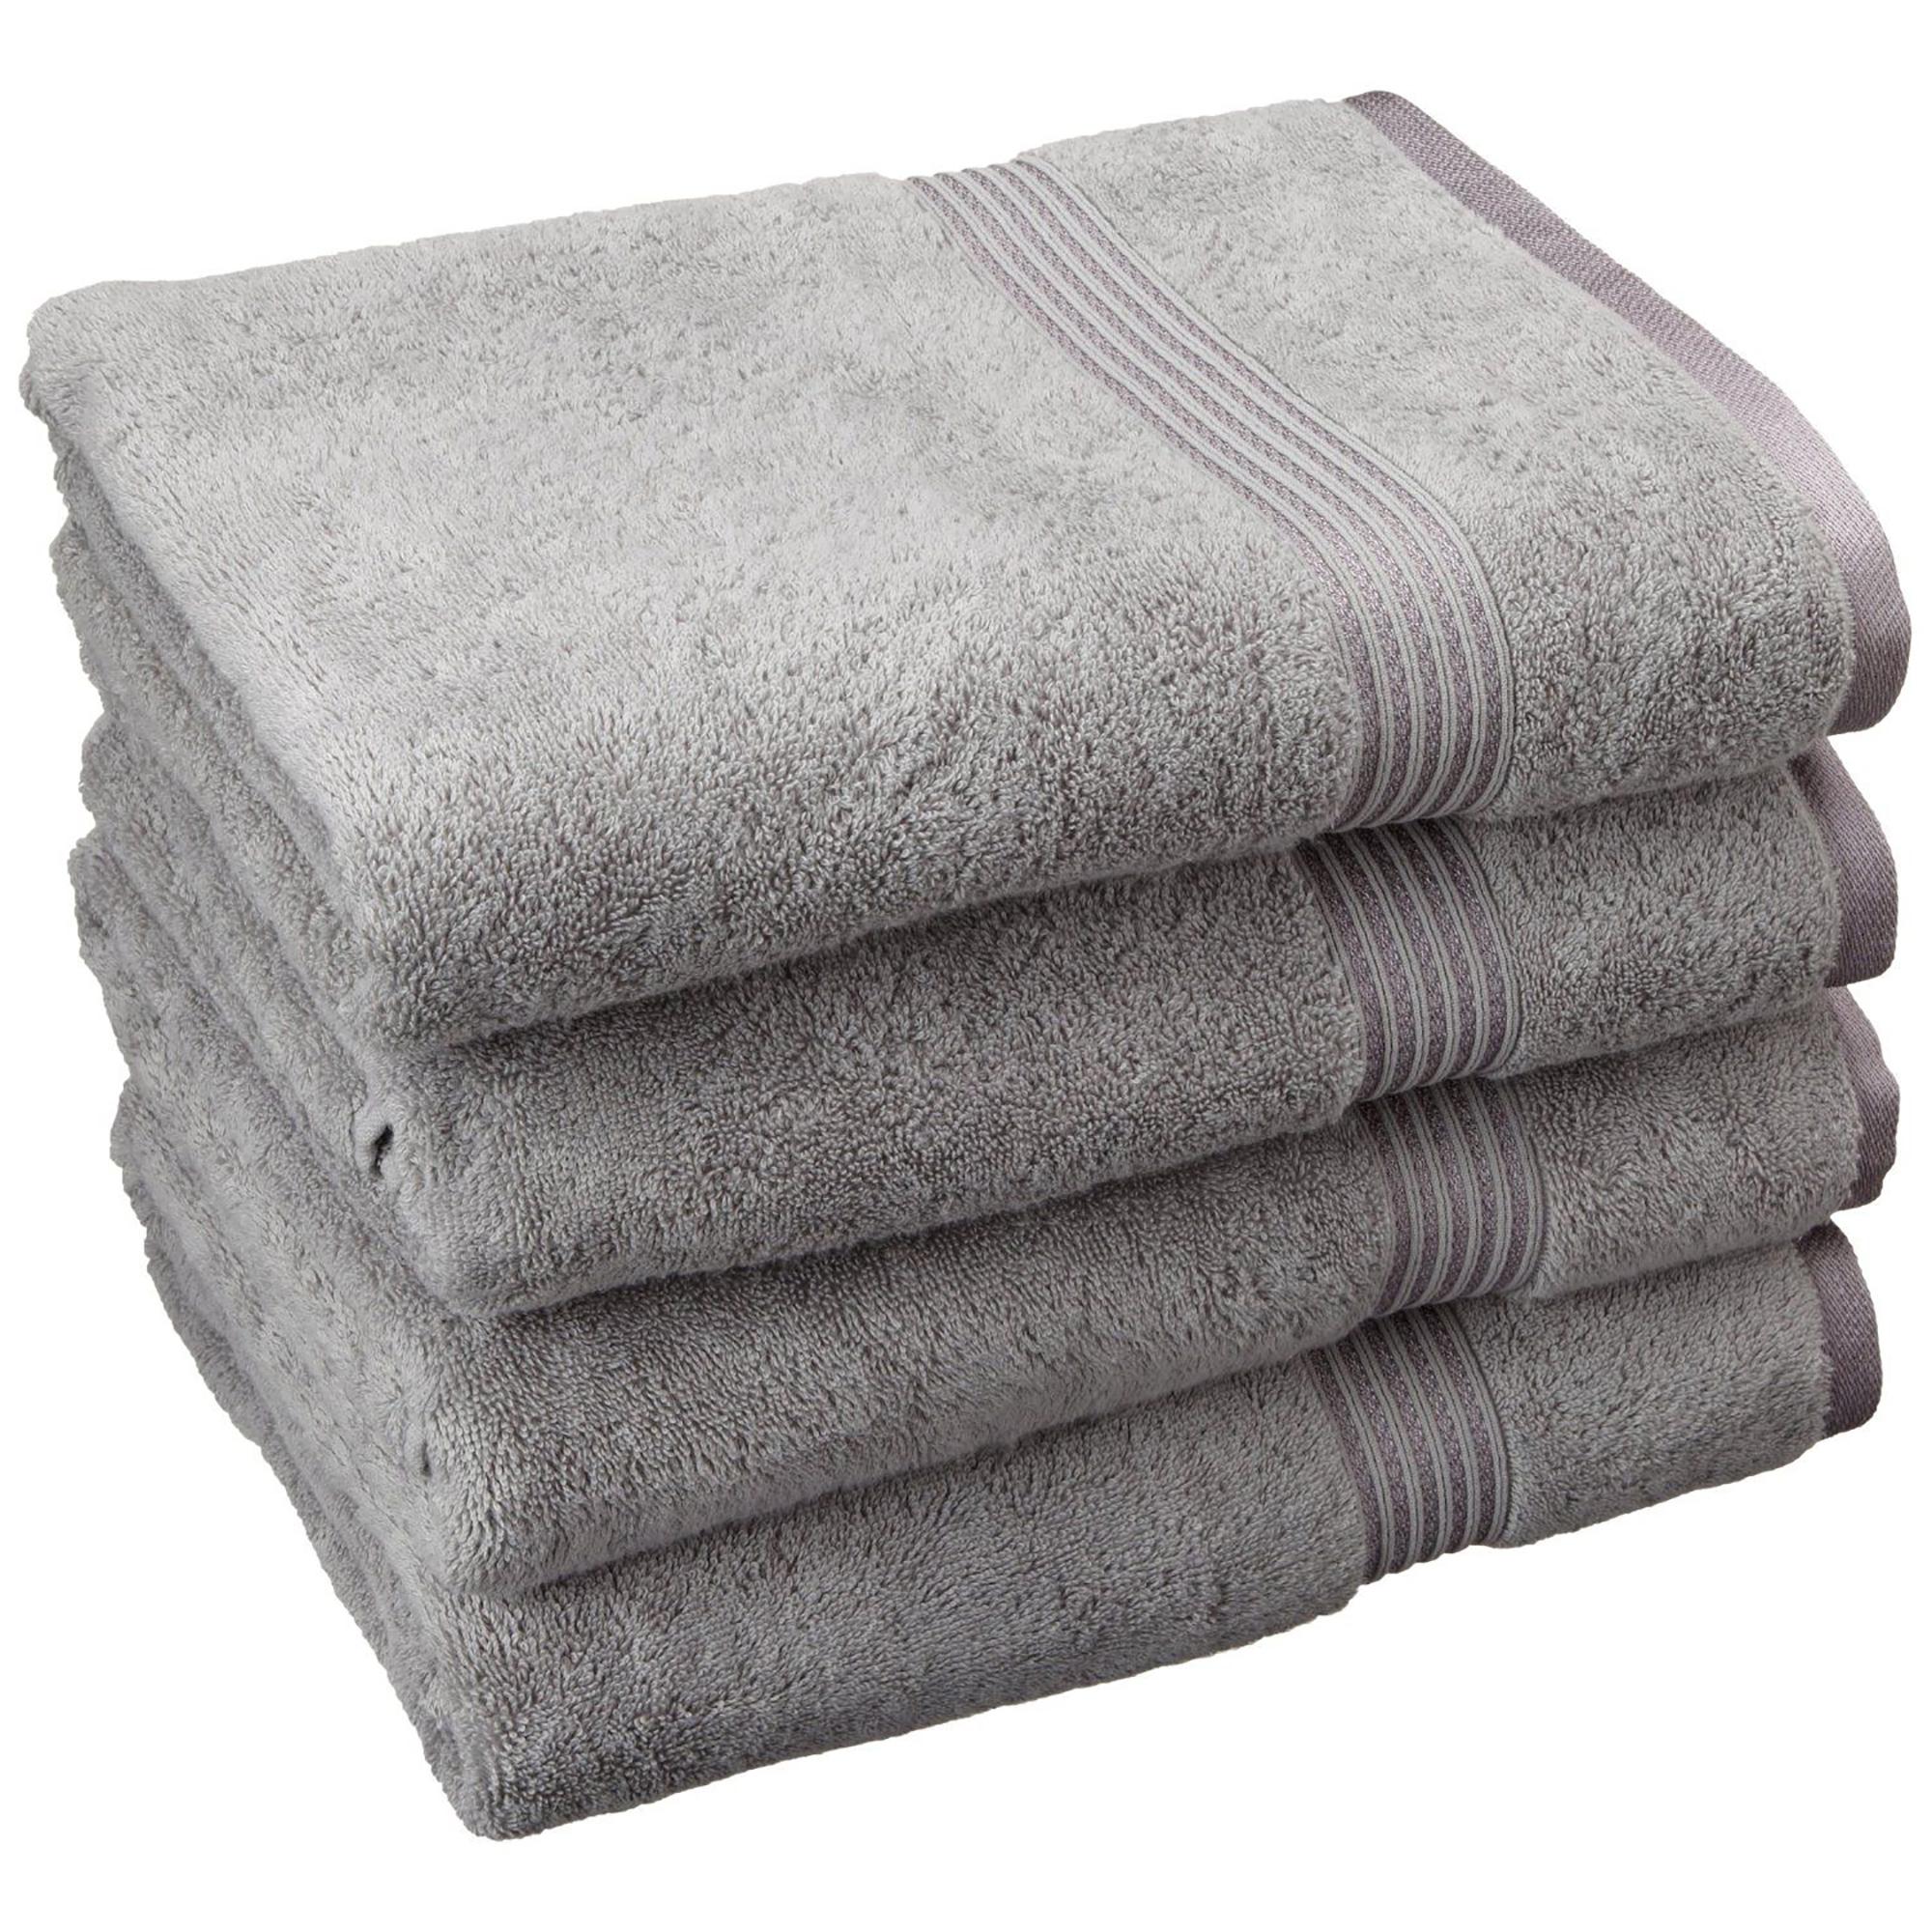 Superior 600GSM Egyptian Quality Cotton 4-Piece Bath Towel Set